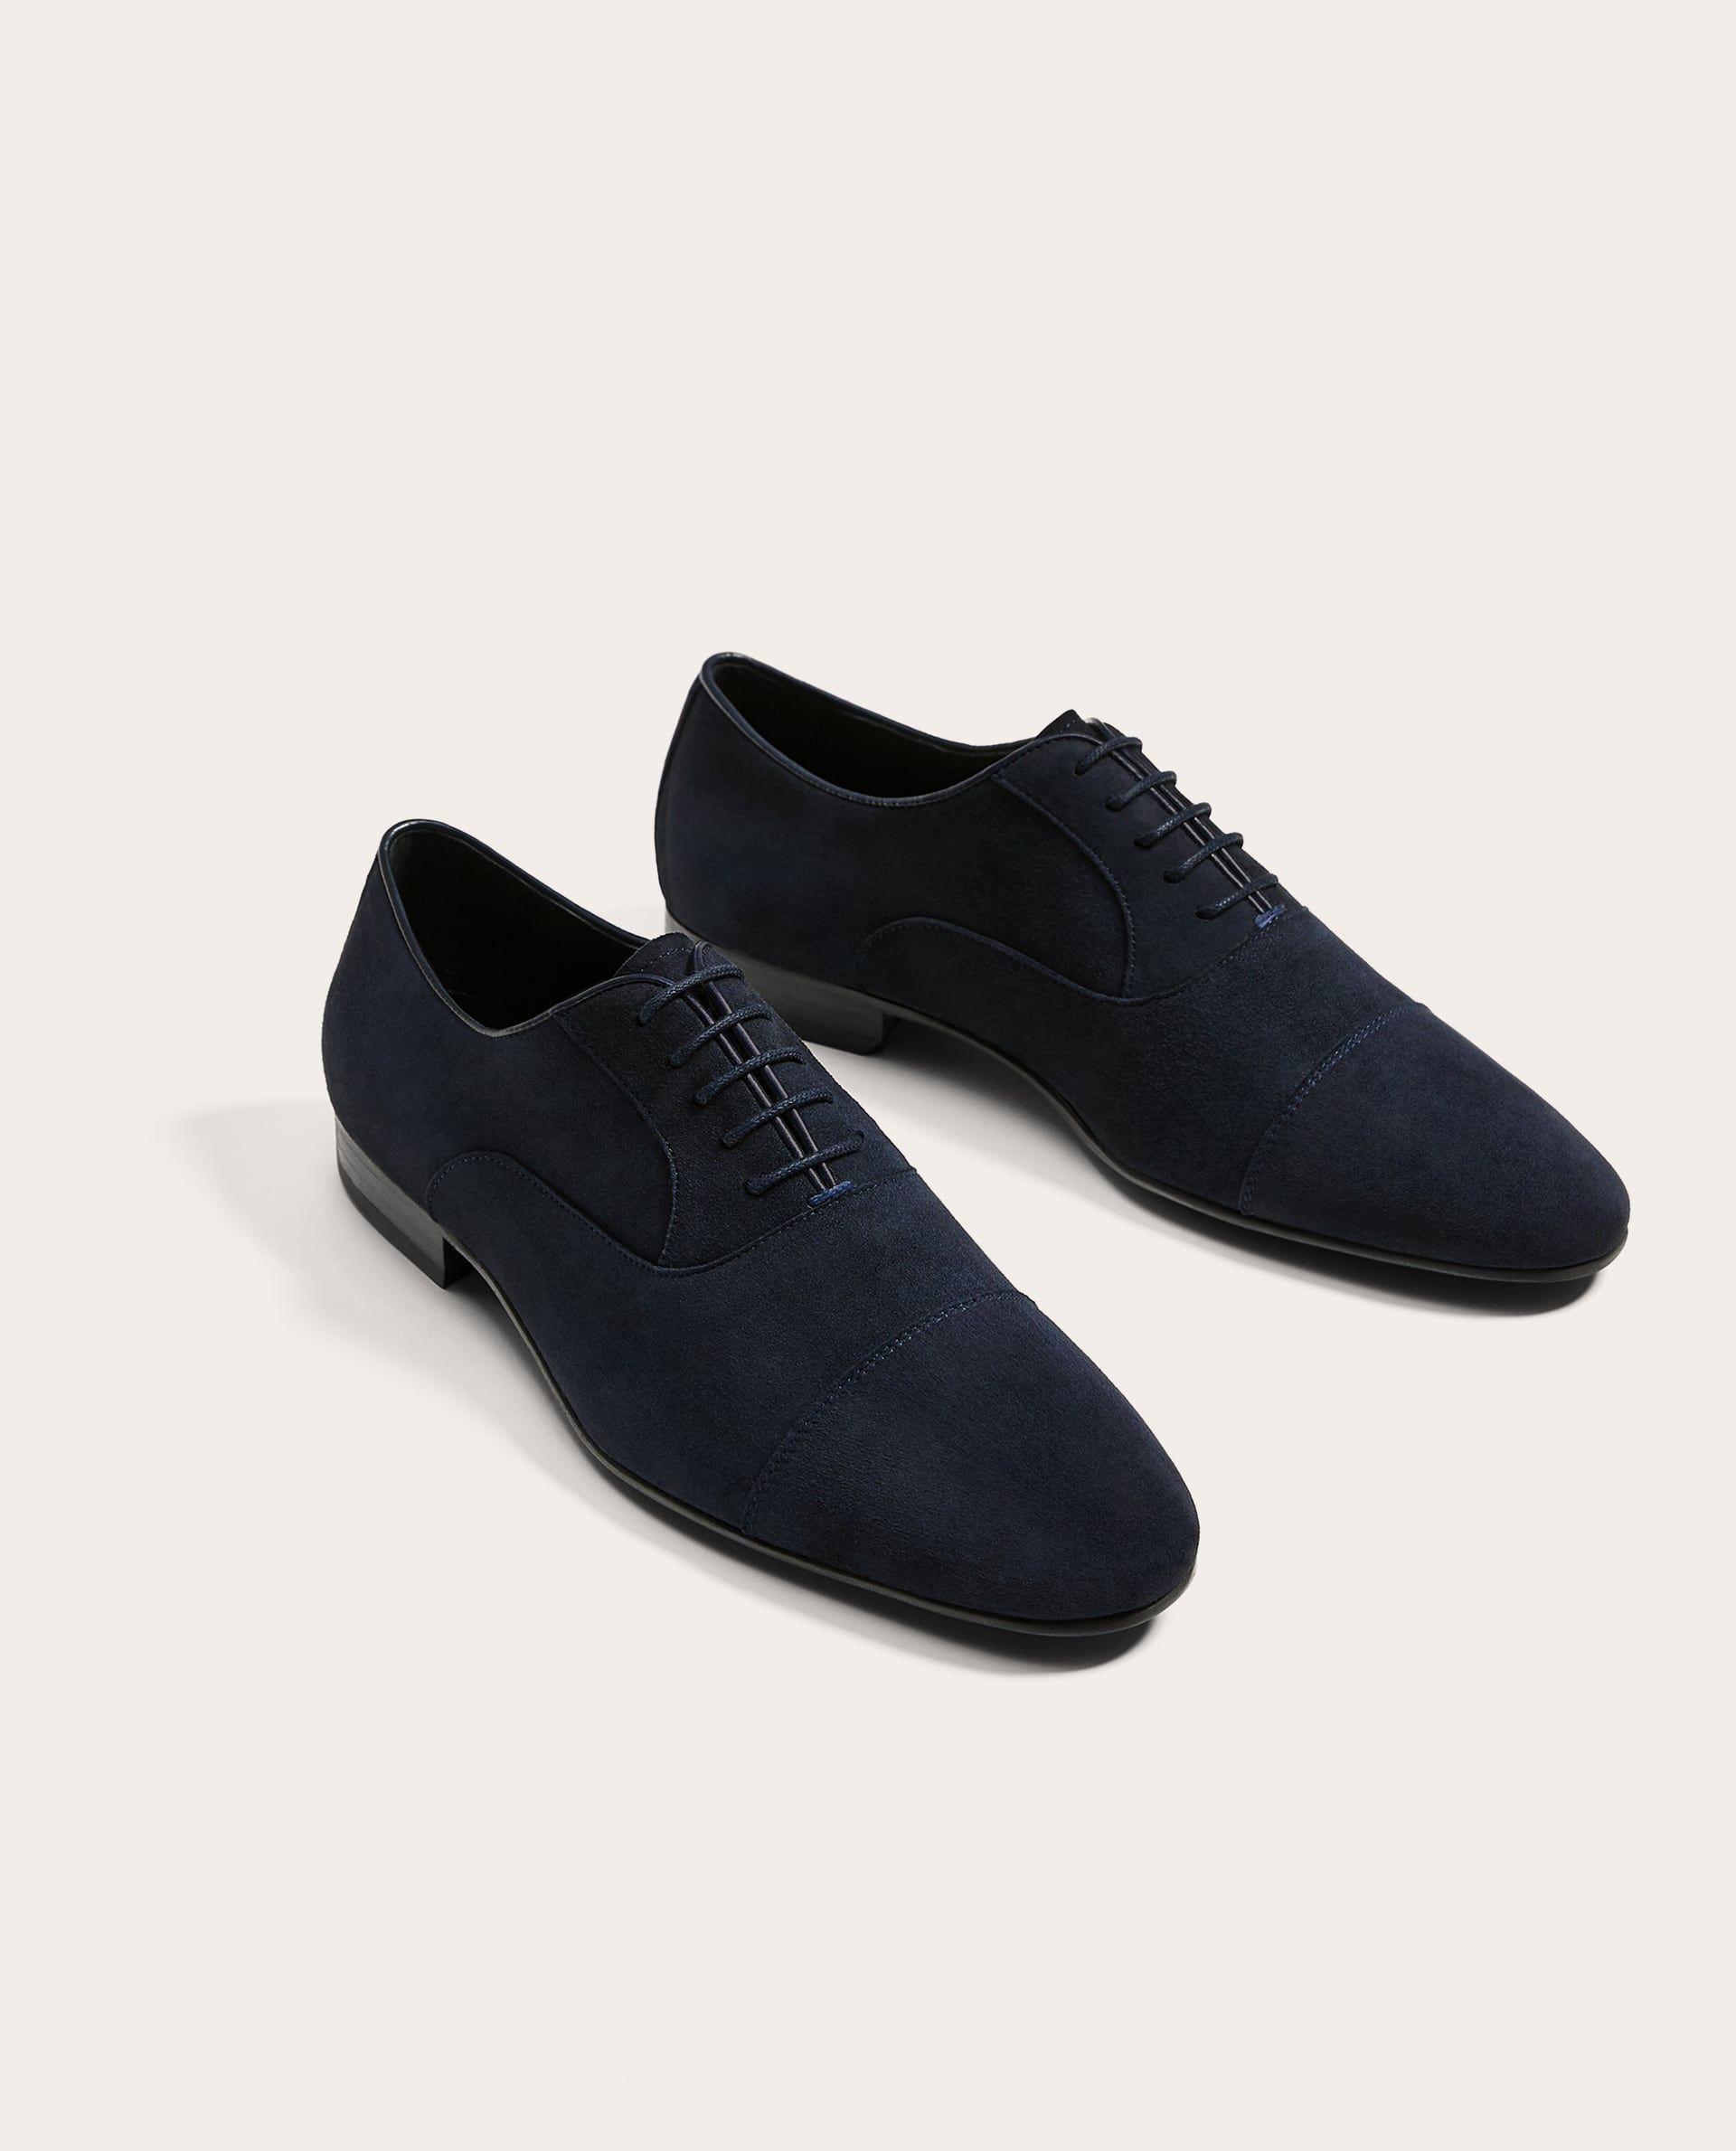 Ante ShoesBlue Suede Zapato MarinoShoes Azul PXn8k0wO